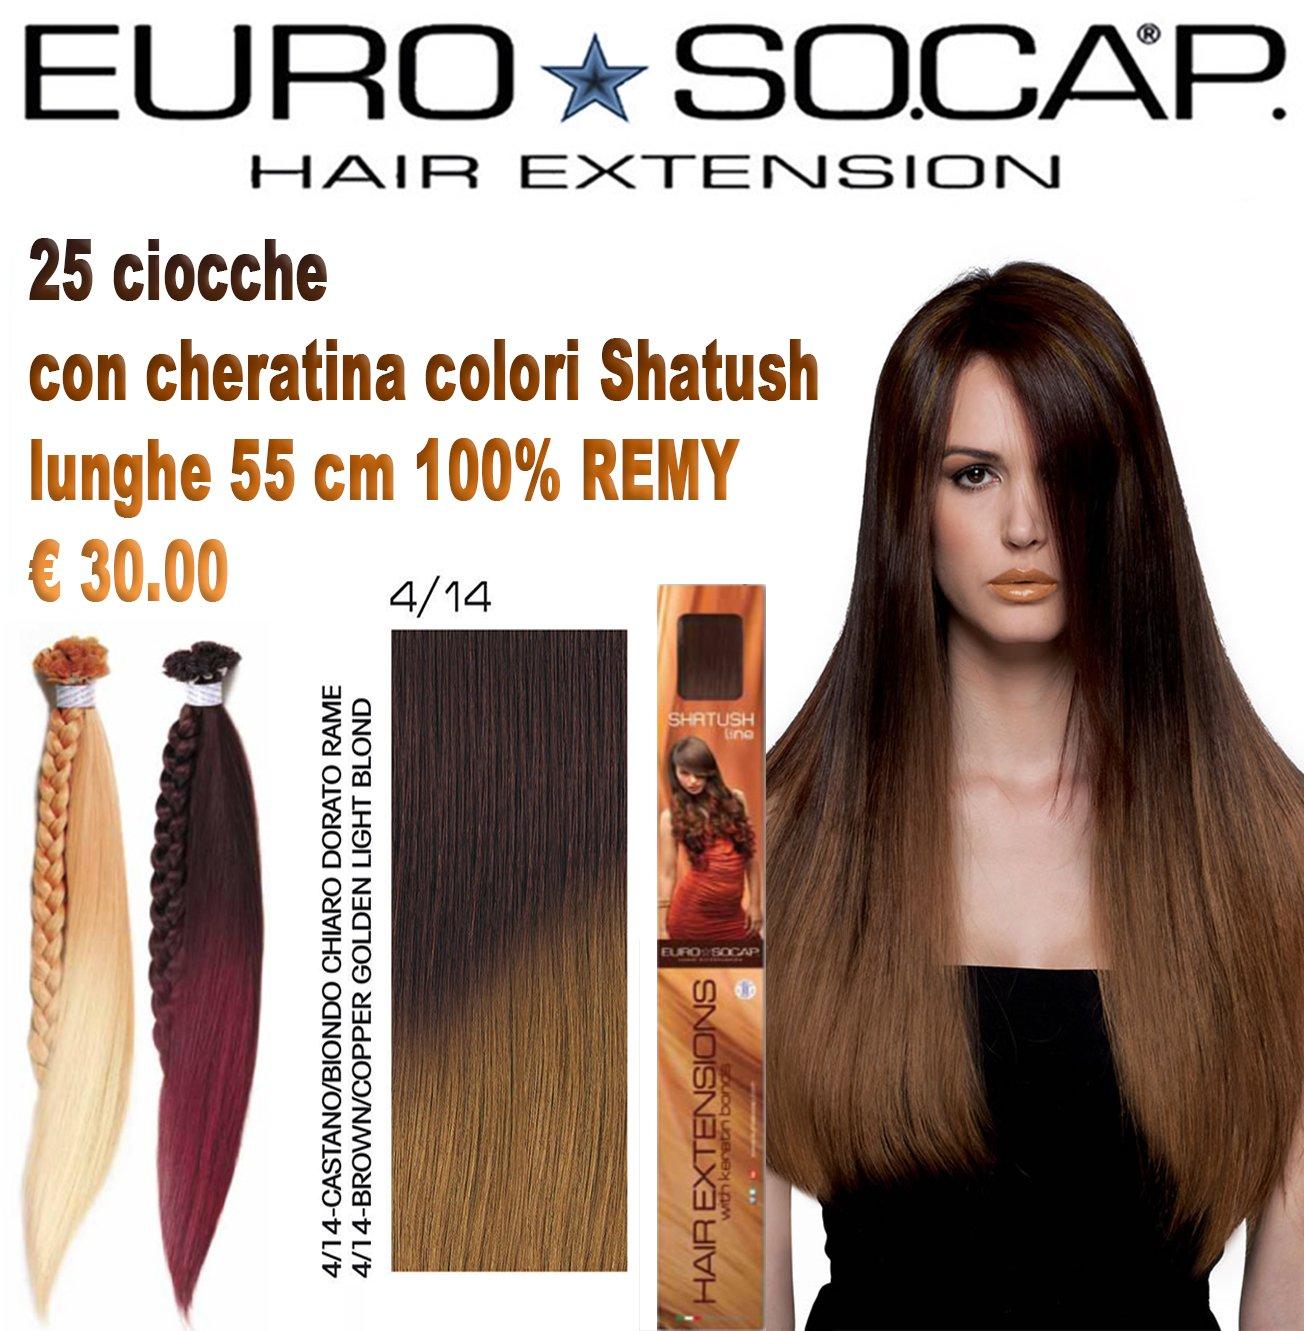 Socap hair extensions